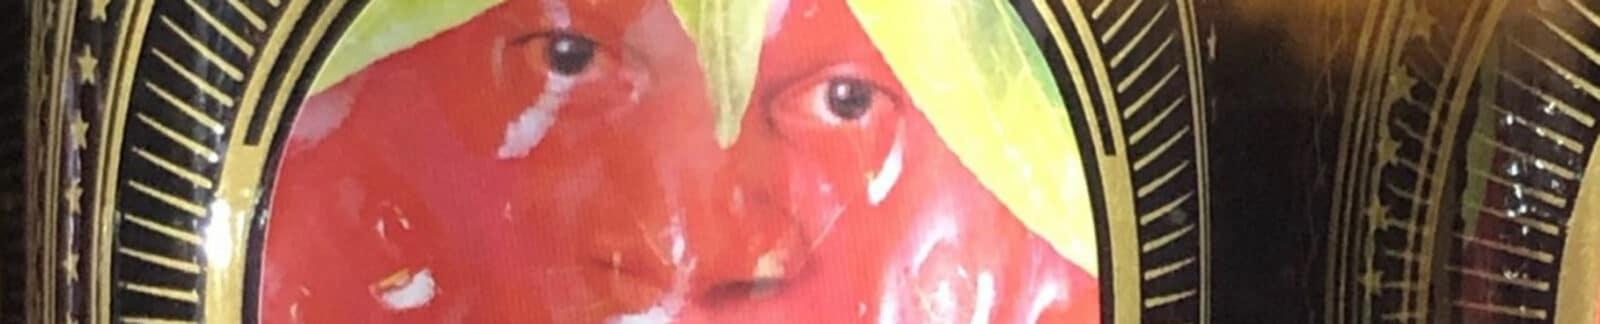 Darryl Strawberry Fruit Ale header